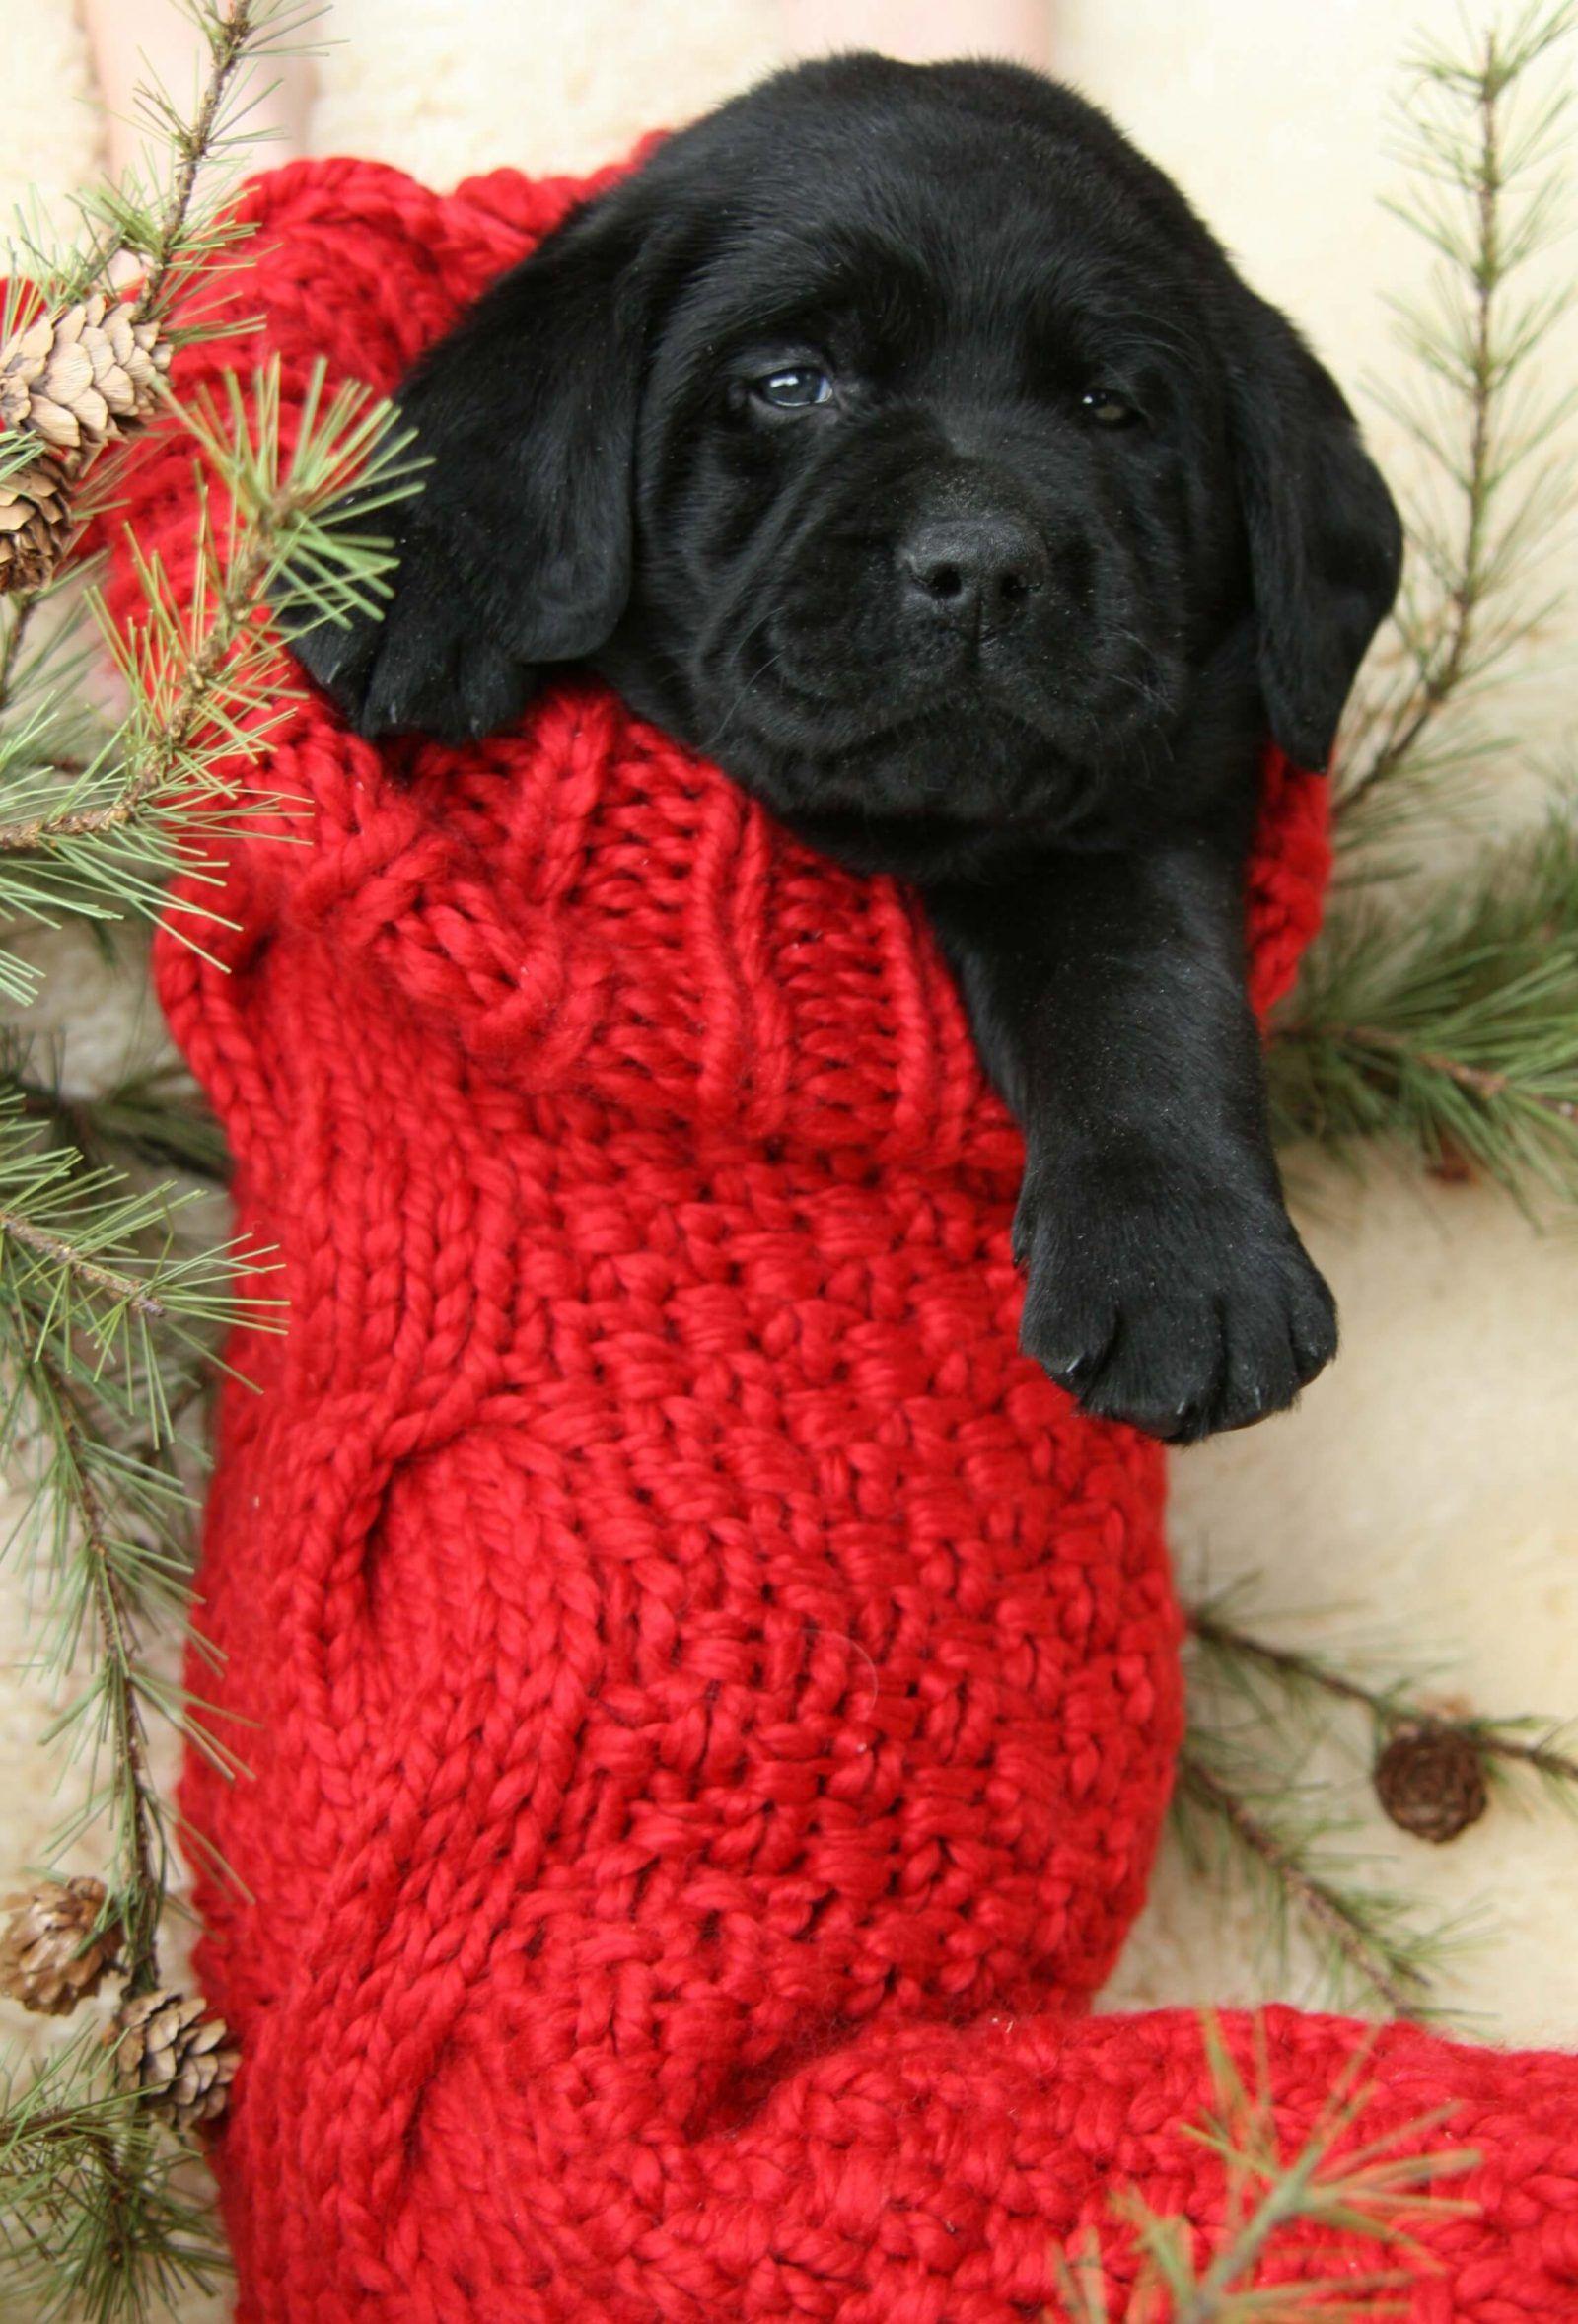 Cool Lab Black Adorable Dog - d91ab5f4973406d59dd43af87b54bdbd  Collection_944179  .jpg